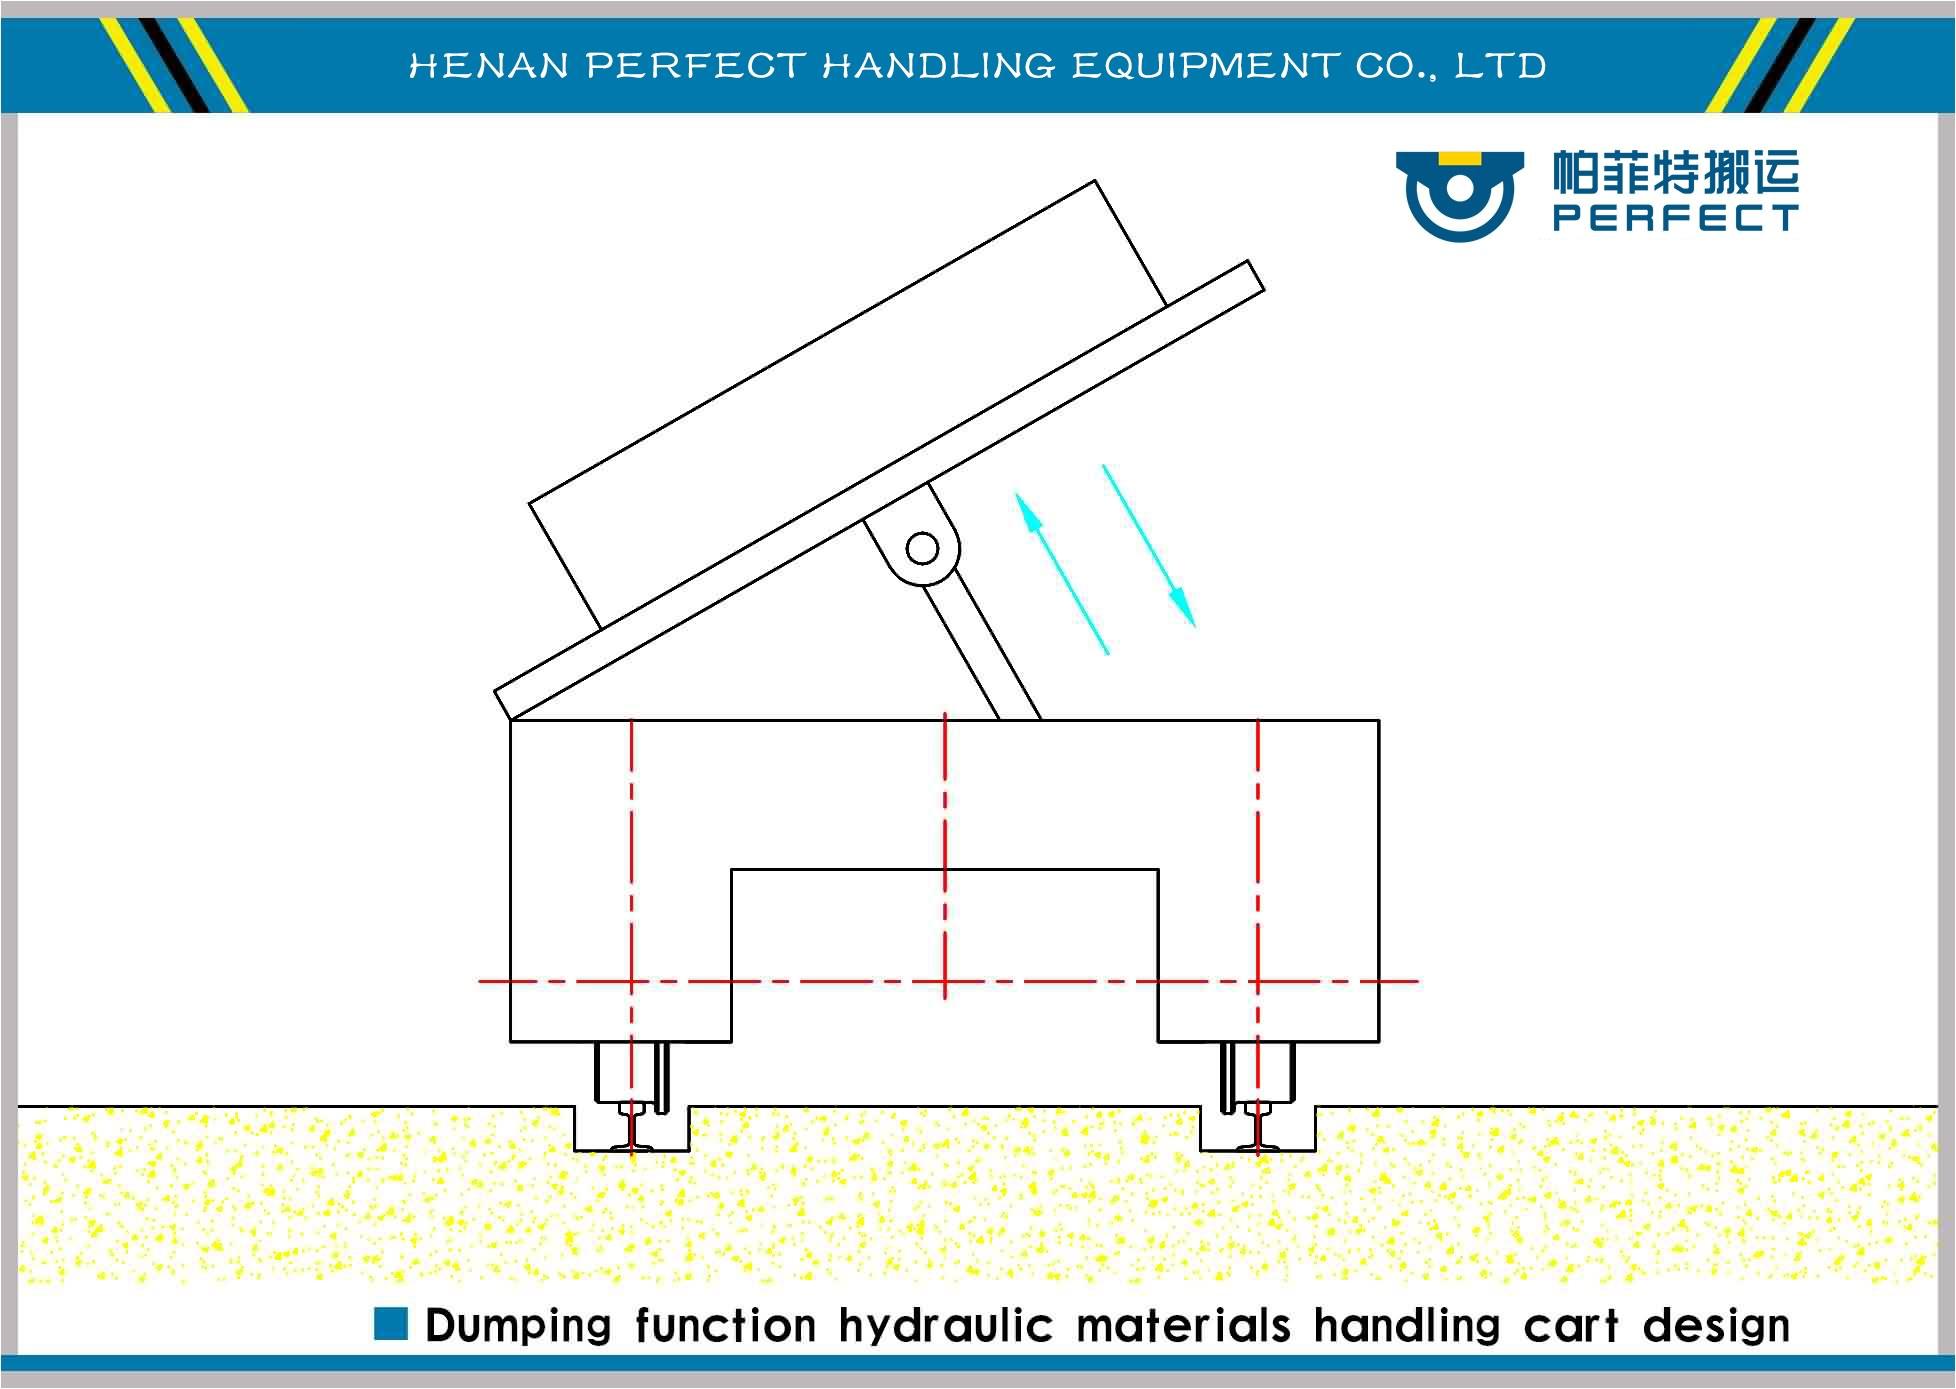 Hydraulic Lift Functions : Dumping function beams handling cart